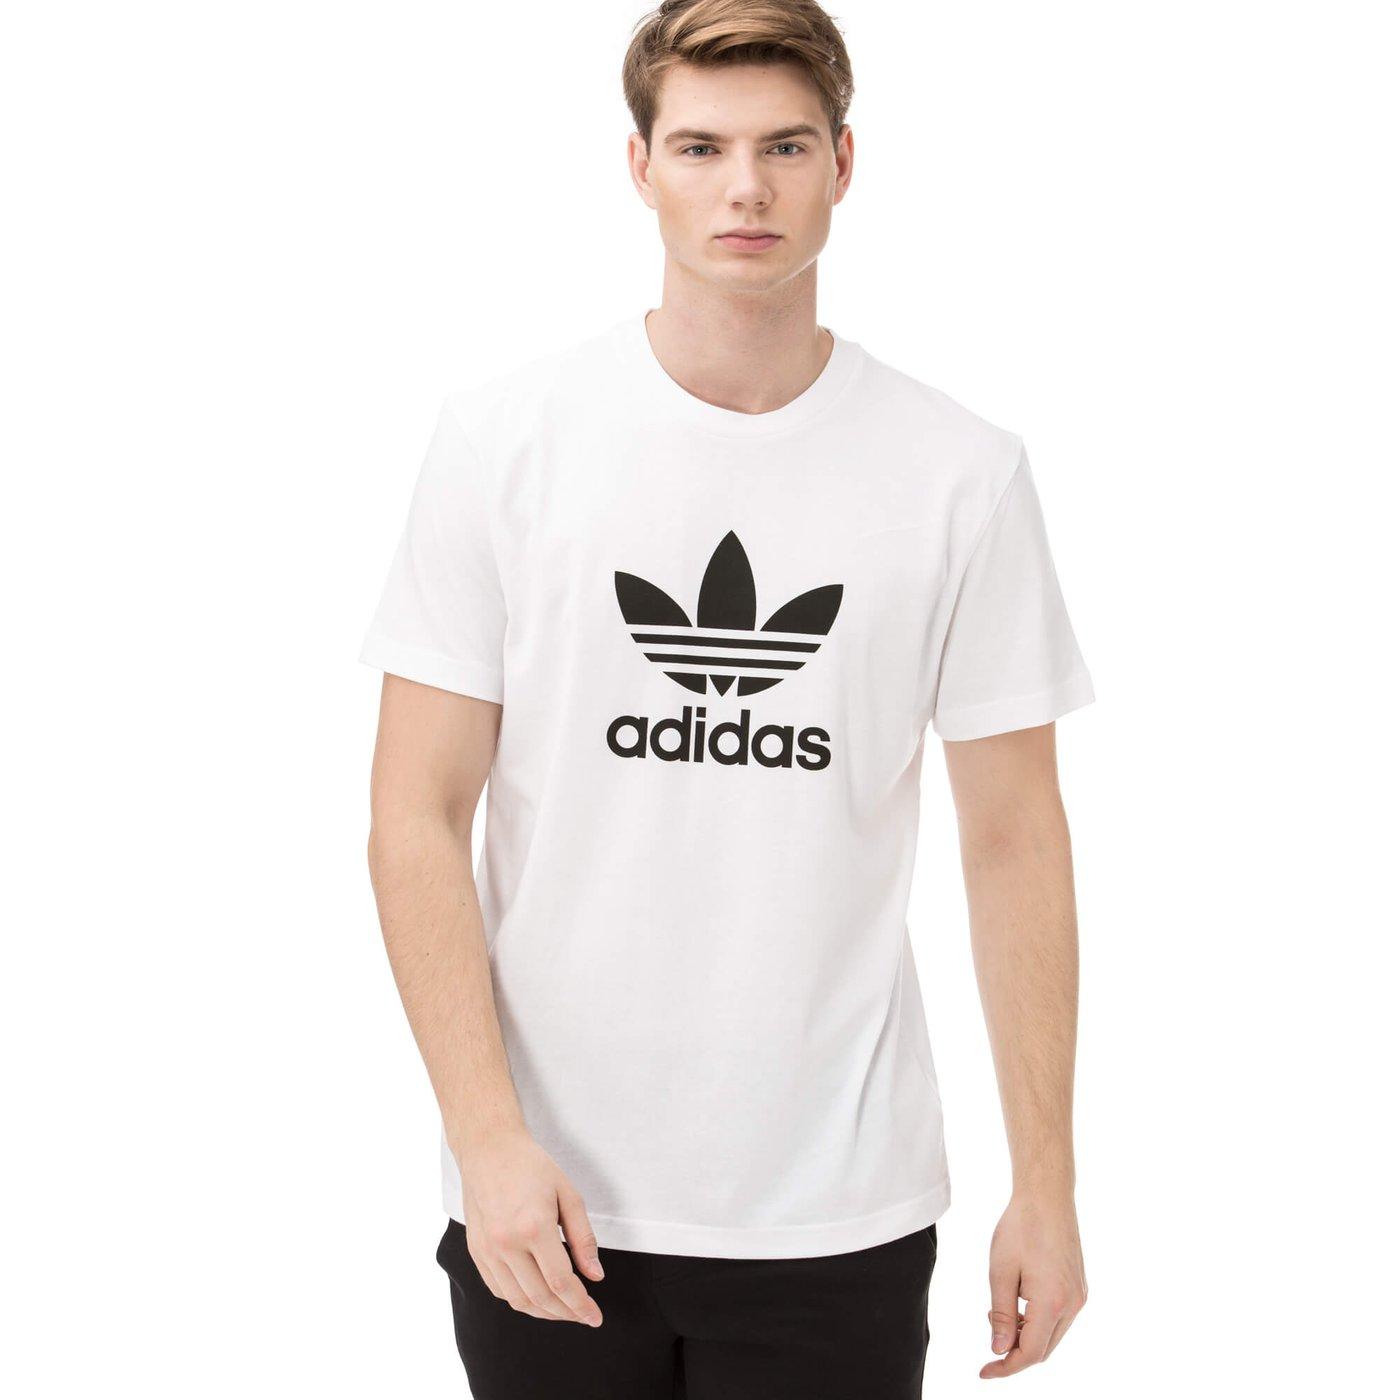 adidas Trefoil Erkek Beyaz Tshirt